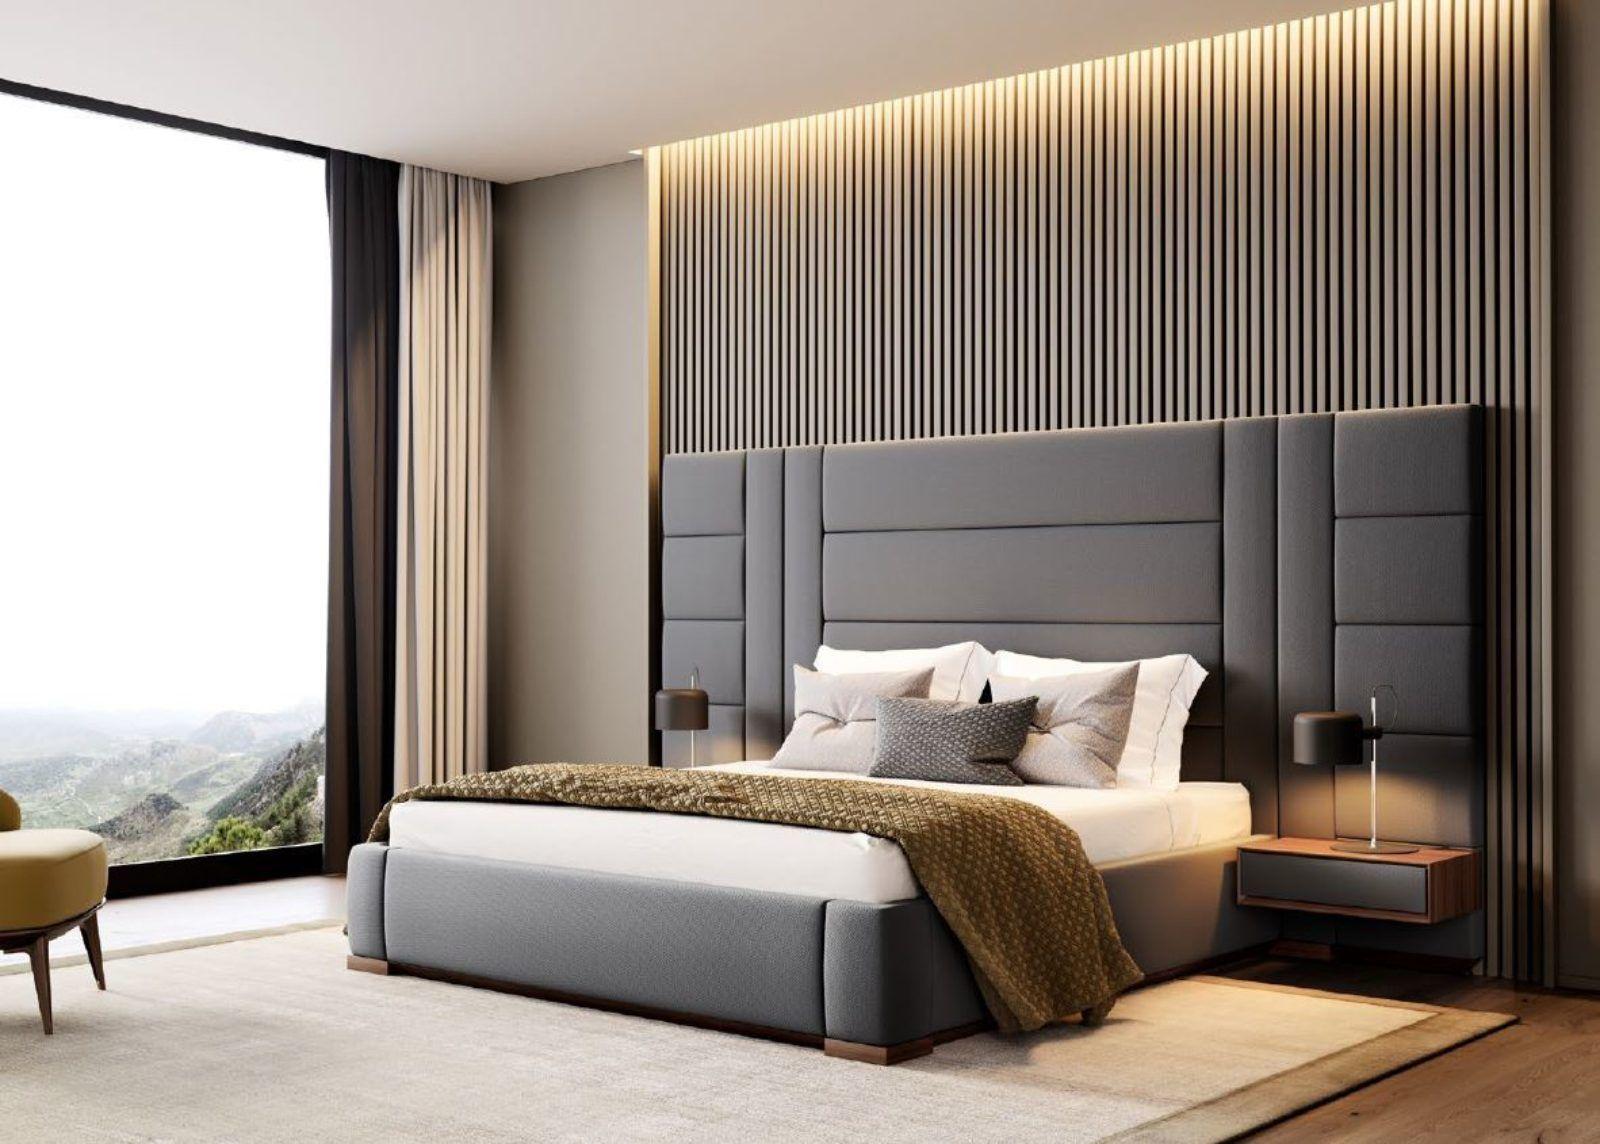 35 Best Bedroom Ideas Are Simple And Fun Room Design Bedroom